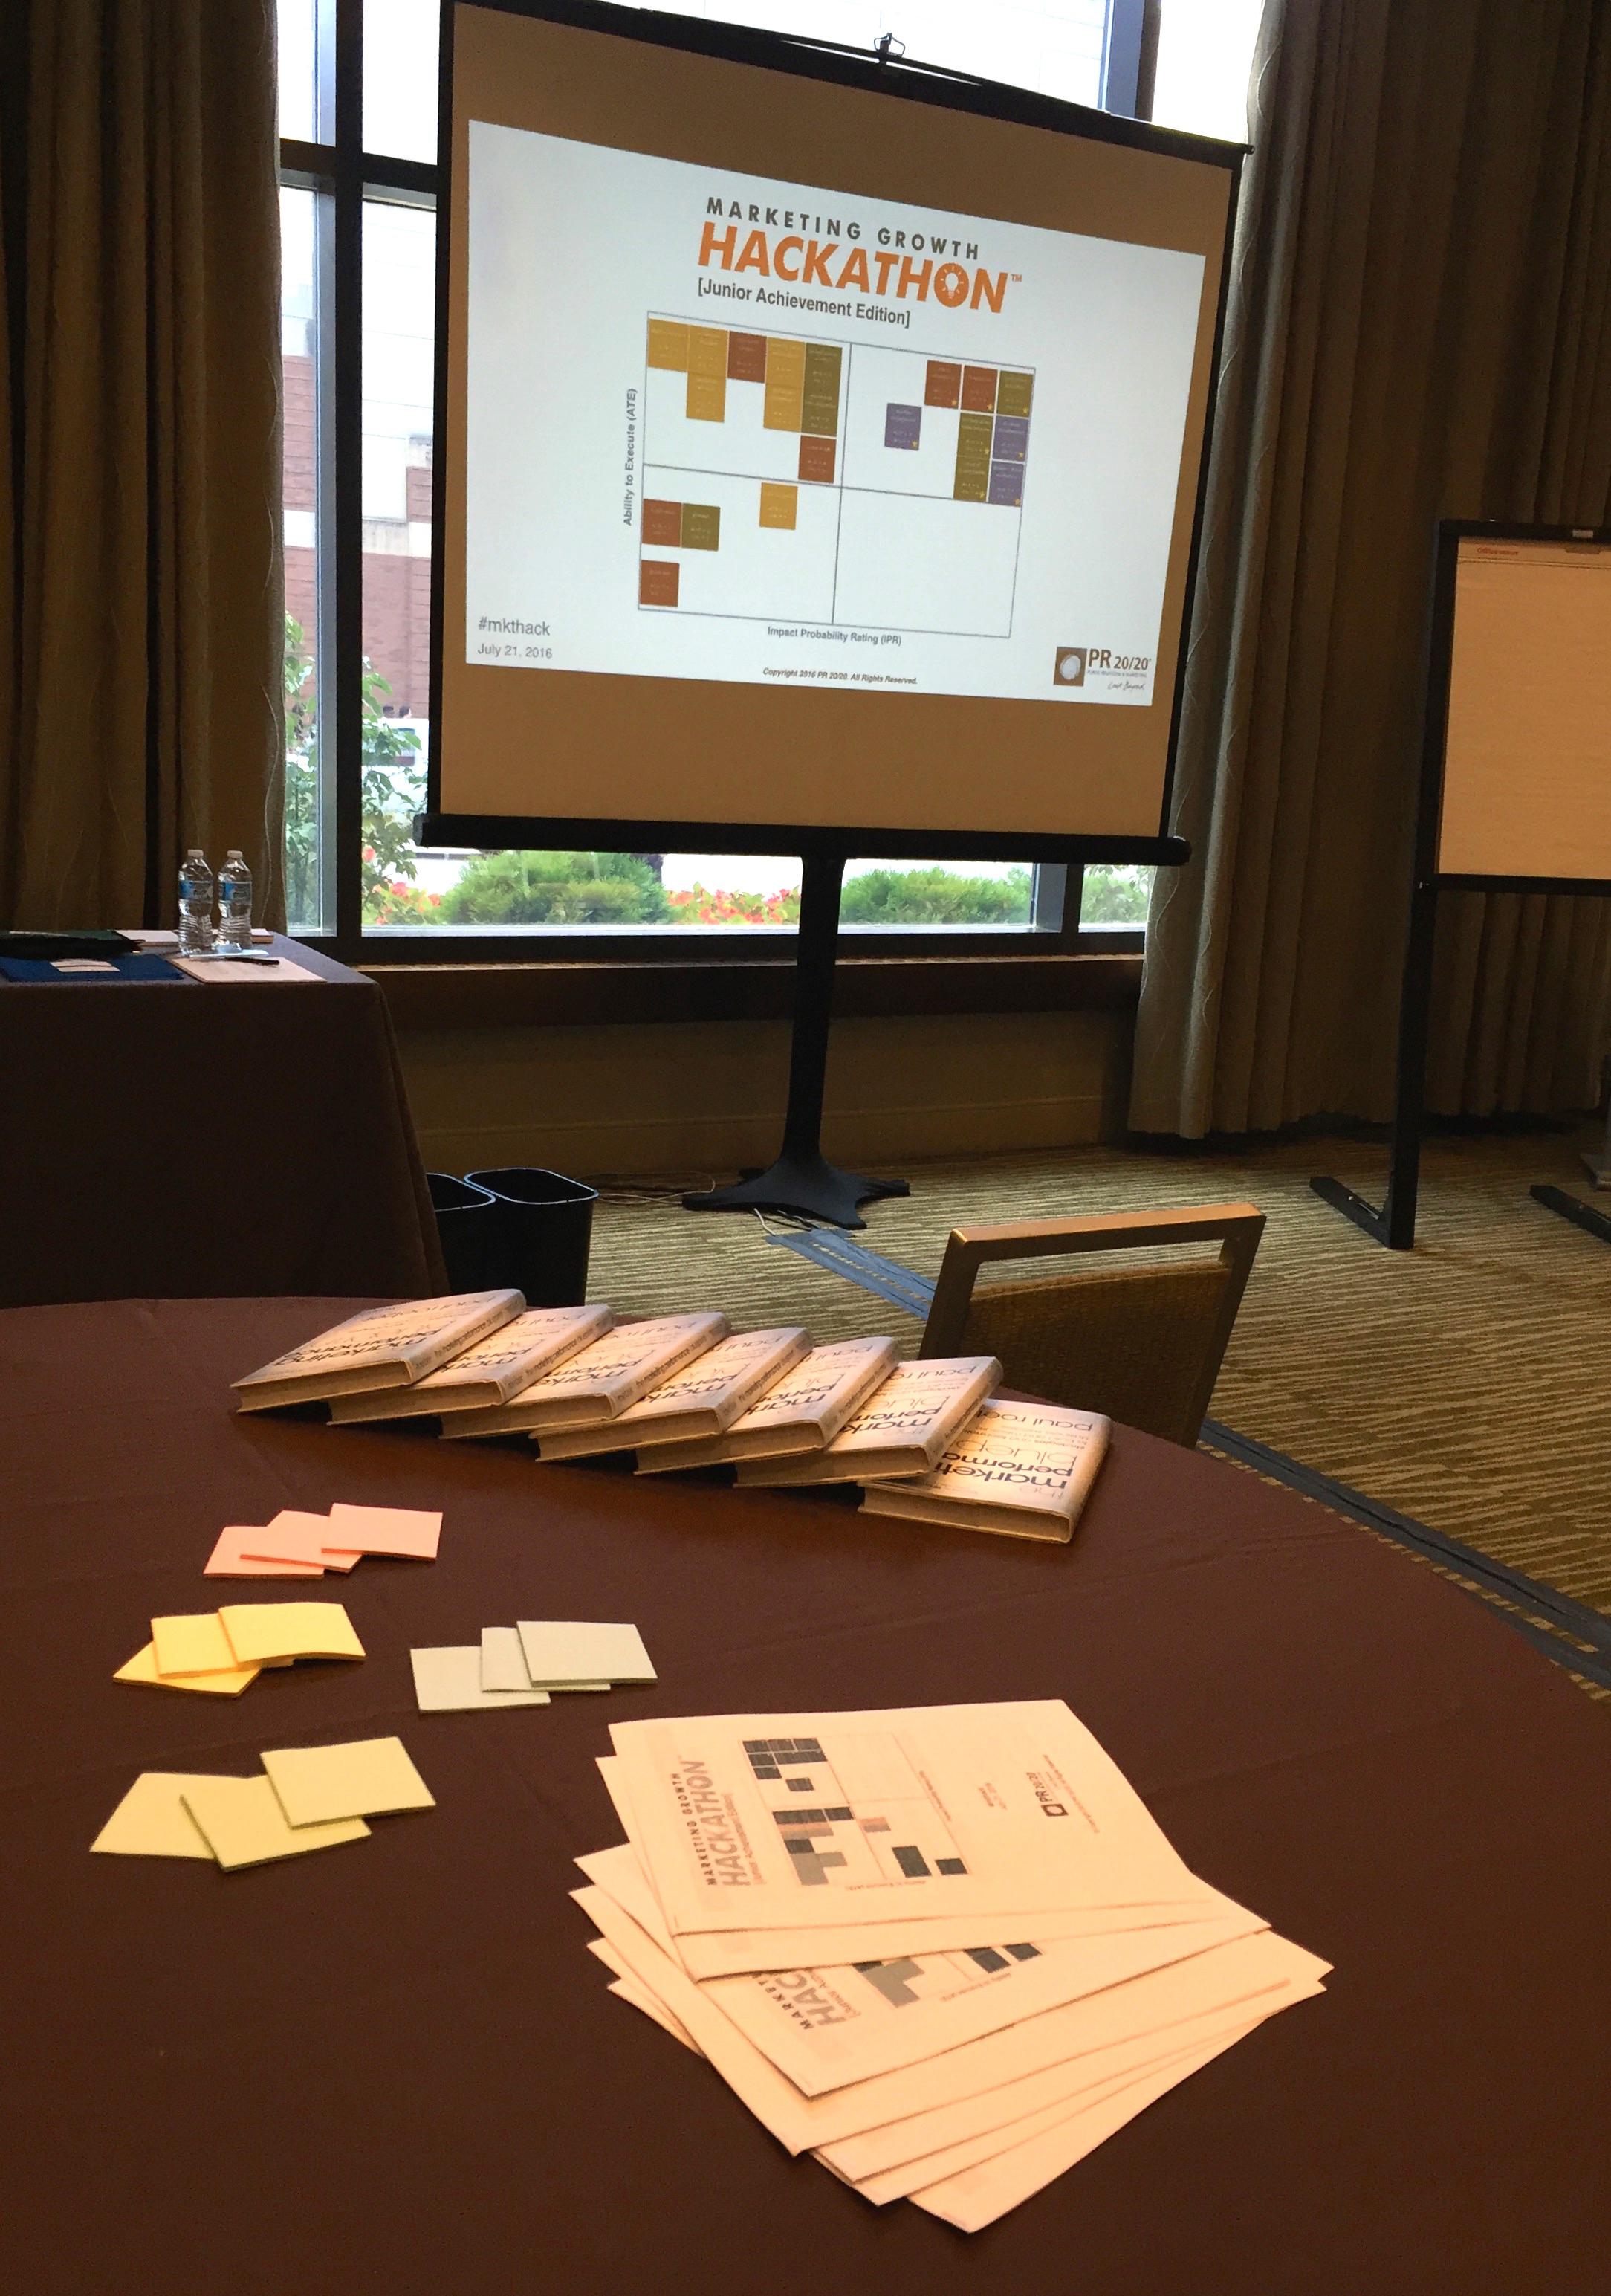 Marketing-Growth-Hackathon-workshop.jpg